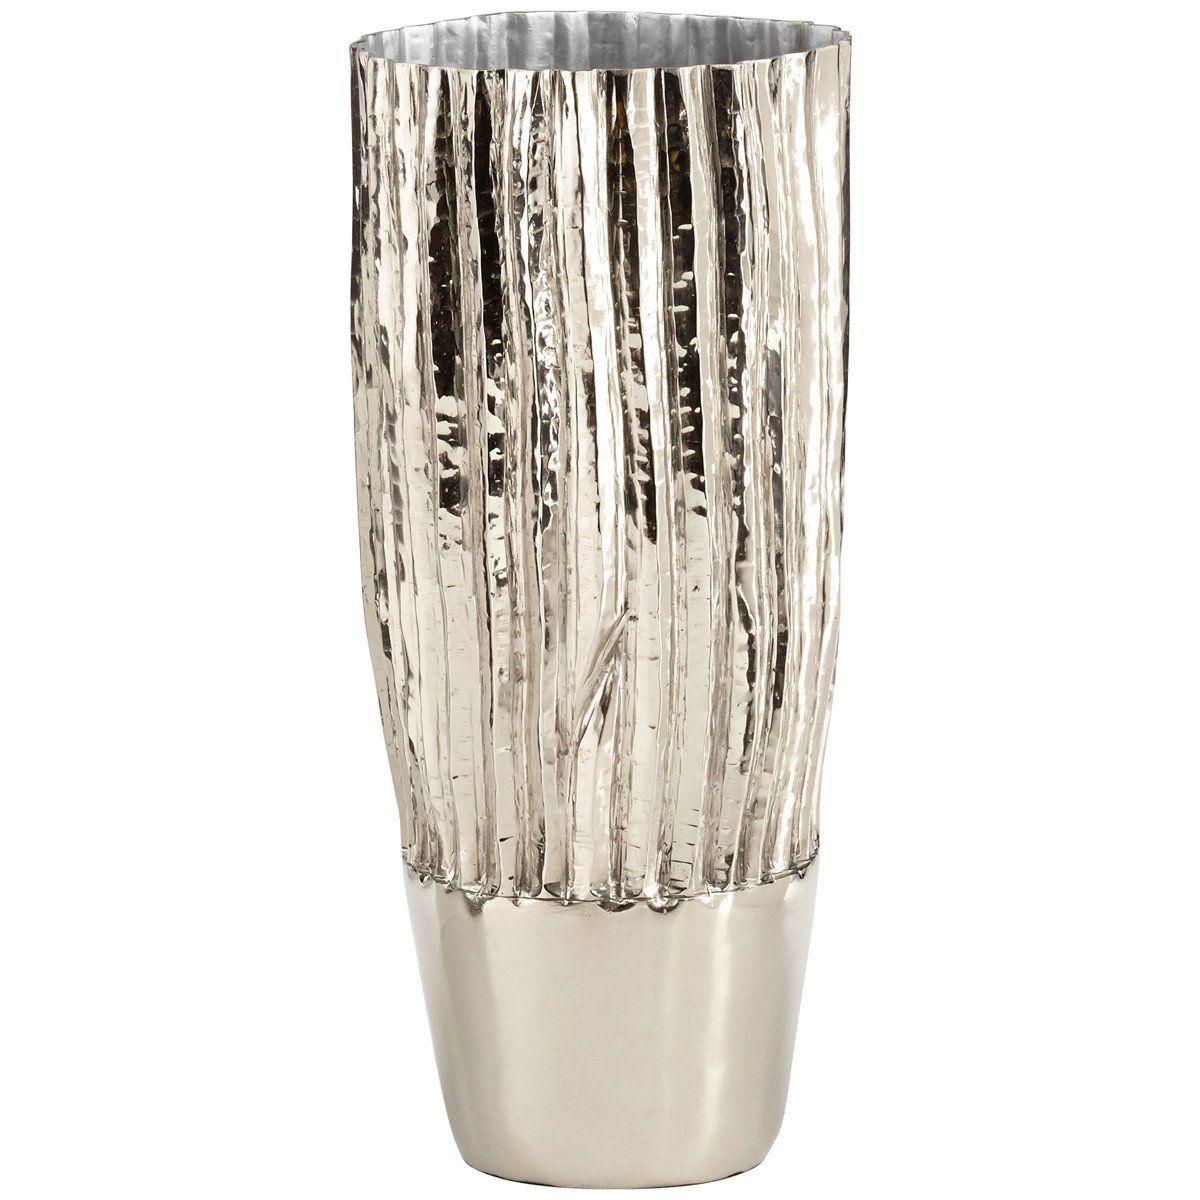 Cyan Design Sardinia Vase Cyan Design Aluminum Vase Small Designs